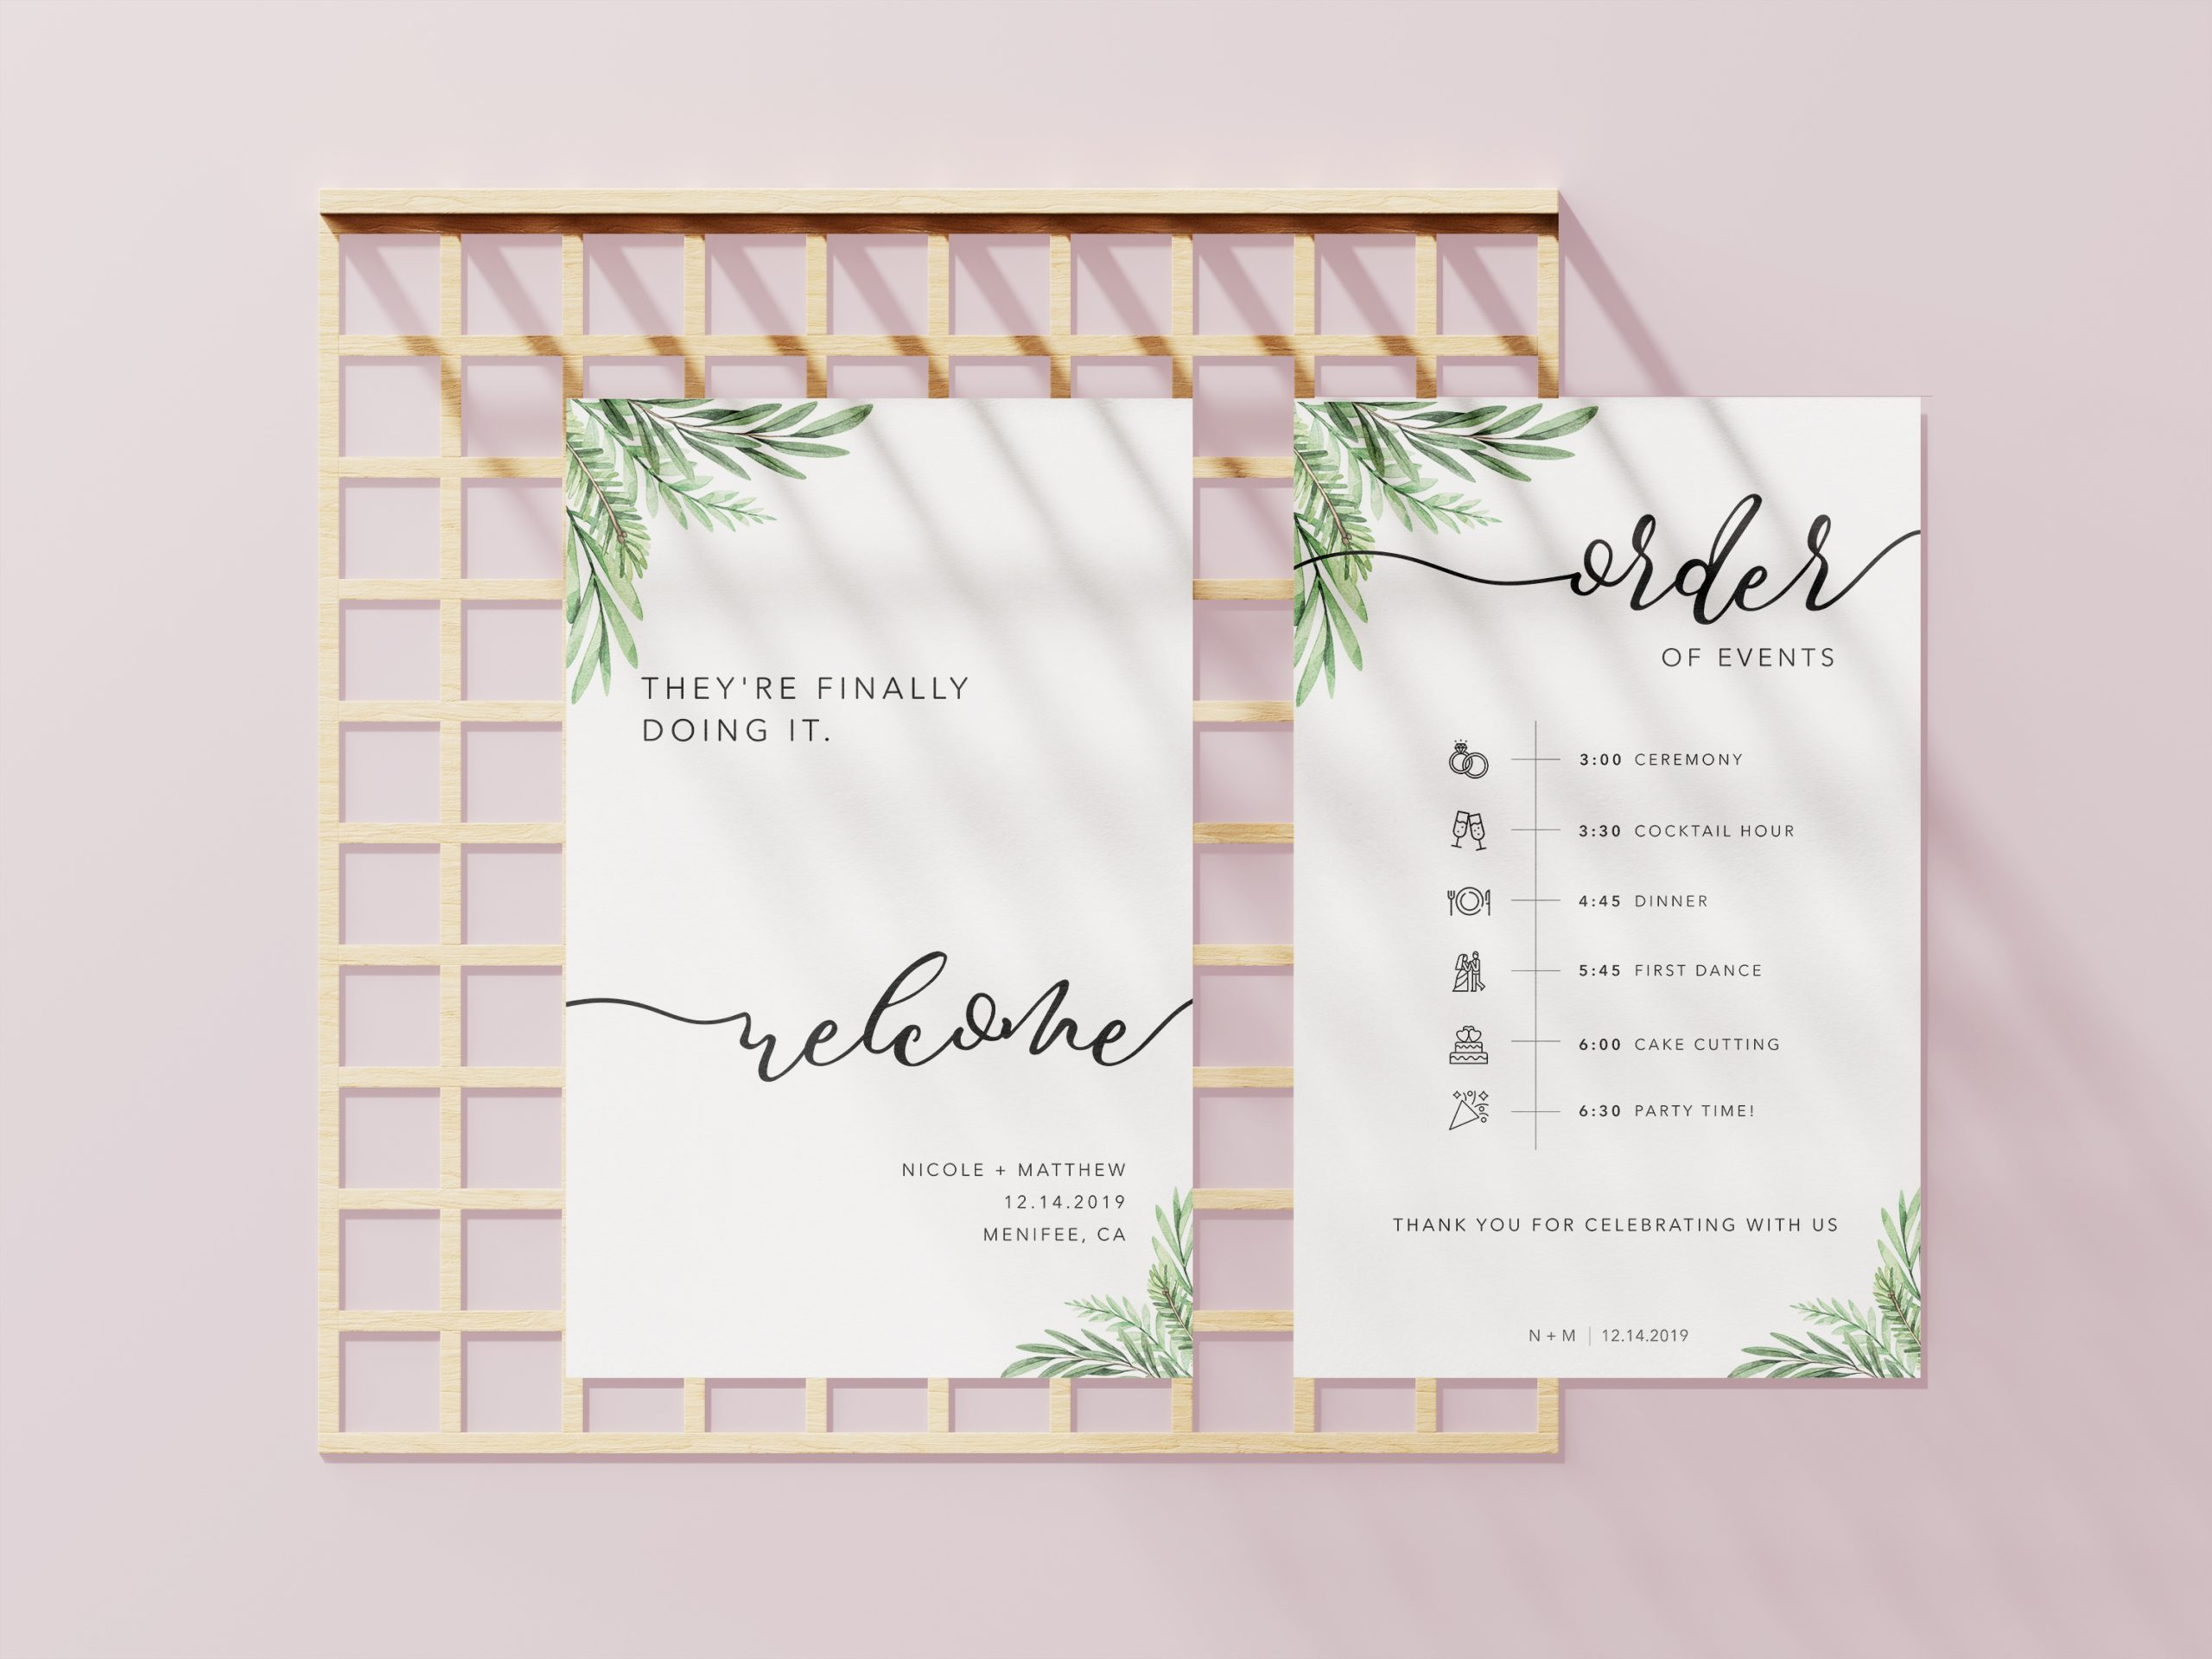 Wedding-sign-mockup